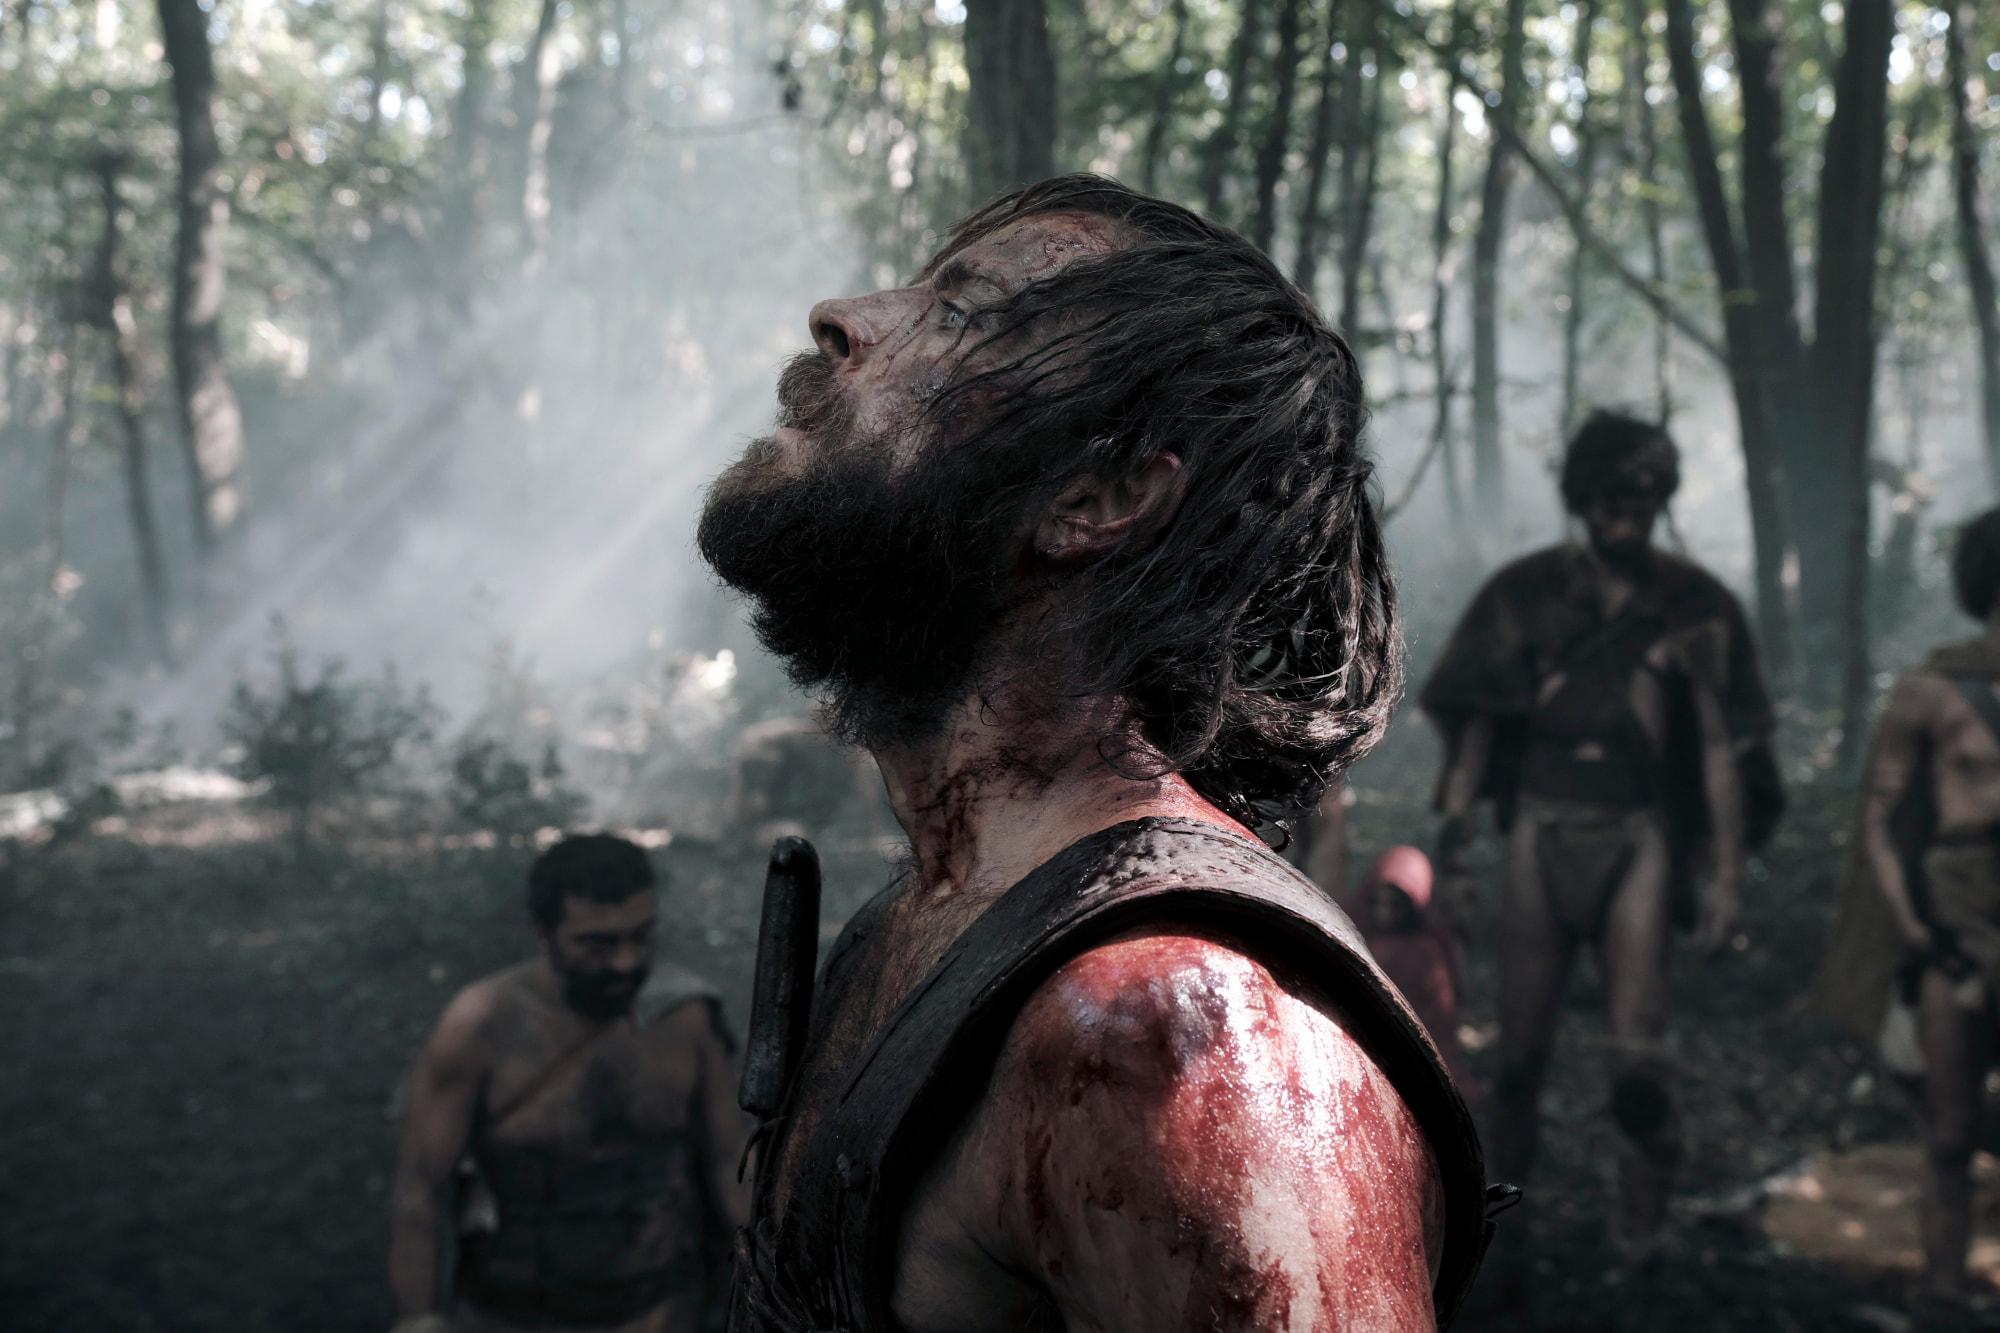 Oscar 2020: Ecco i film candidati a rappresentare l'Italia thumbnail